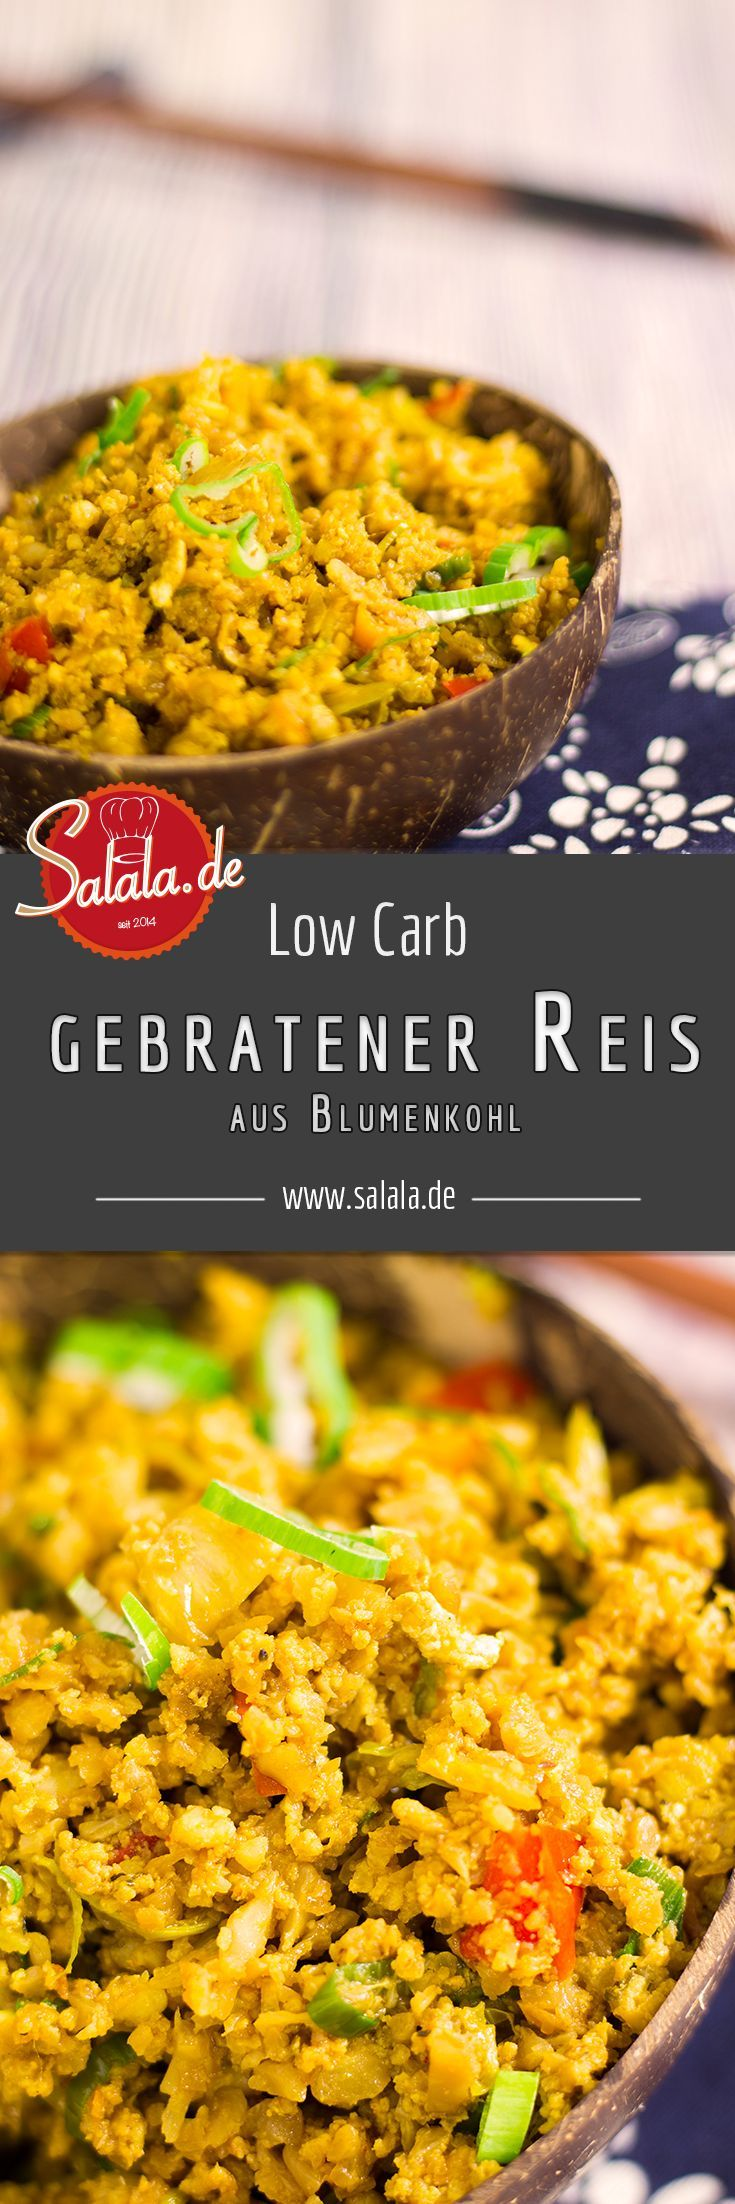 Gebratener Reis   low carb   salala.de – Low Carb leicht gemacht